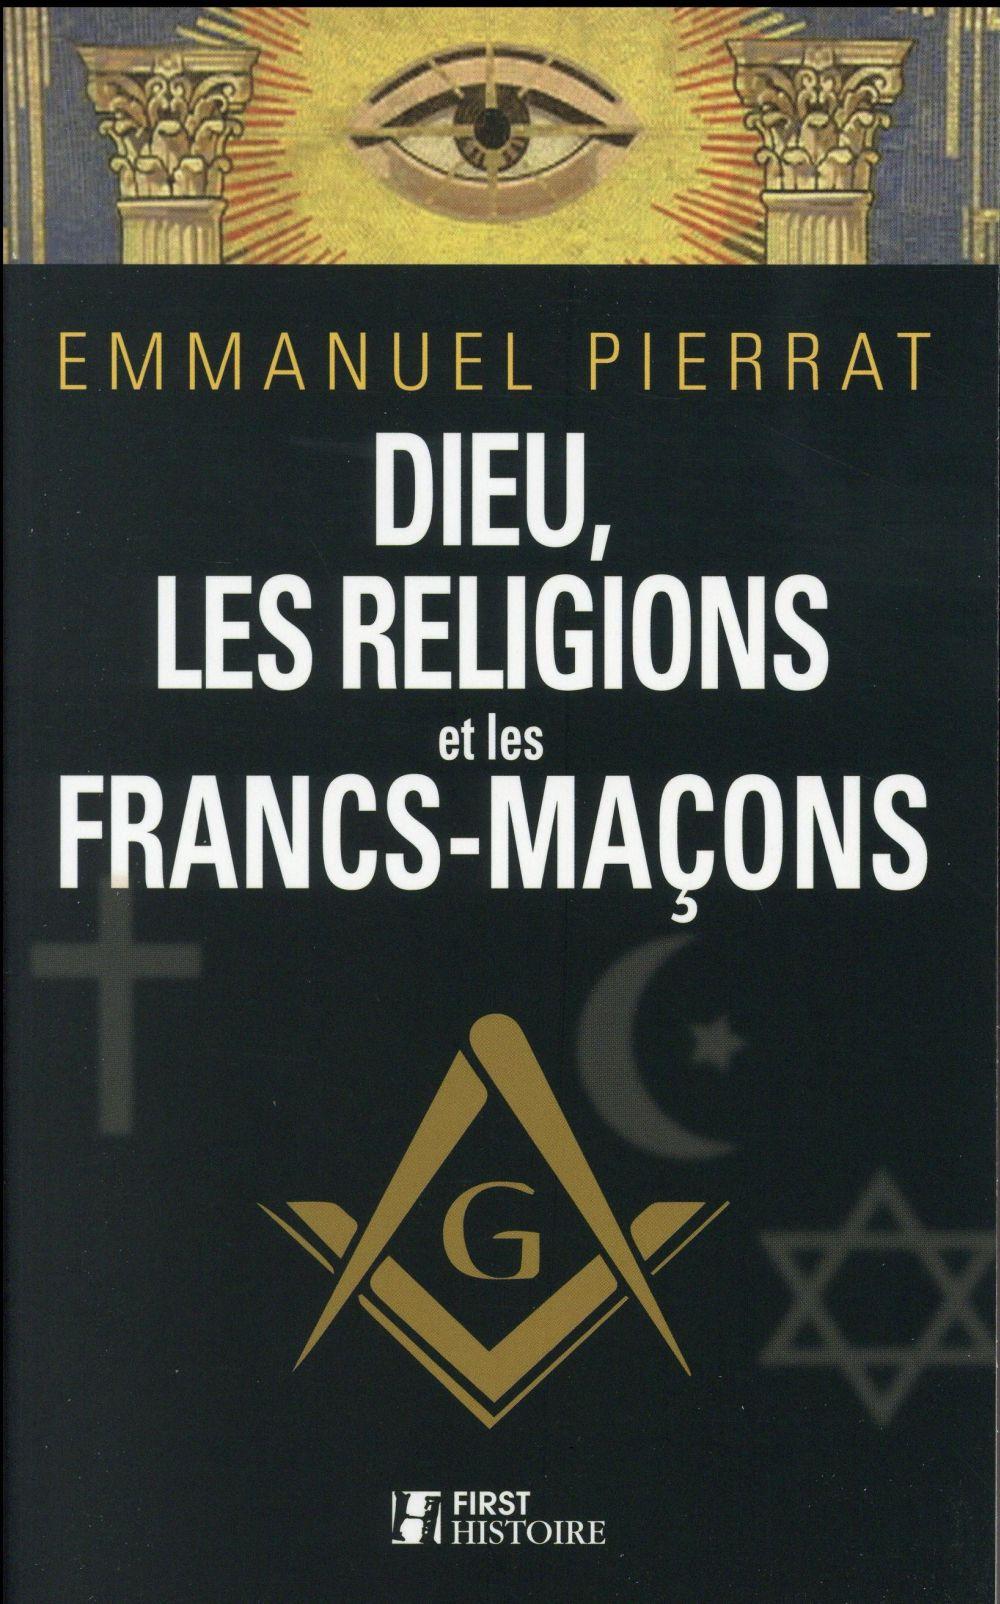 DIEU, LES RELIGIONS ET LES FRANCS-MACONS